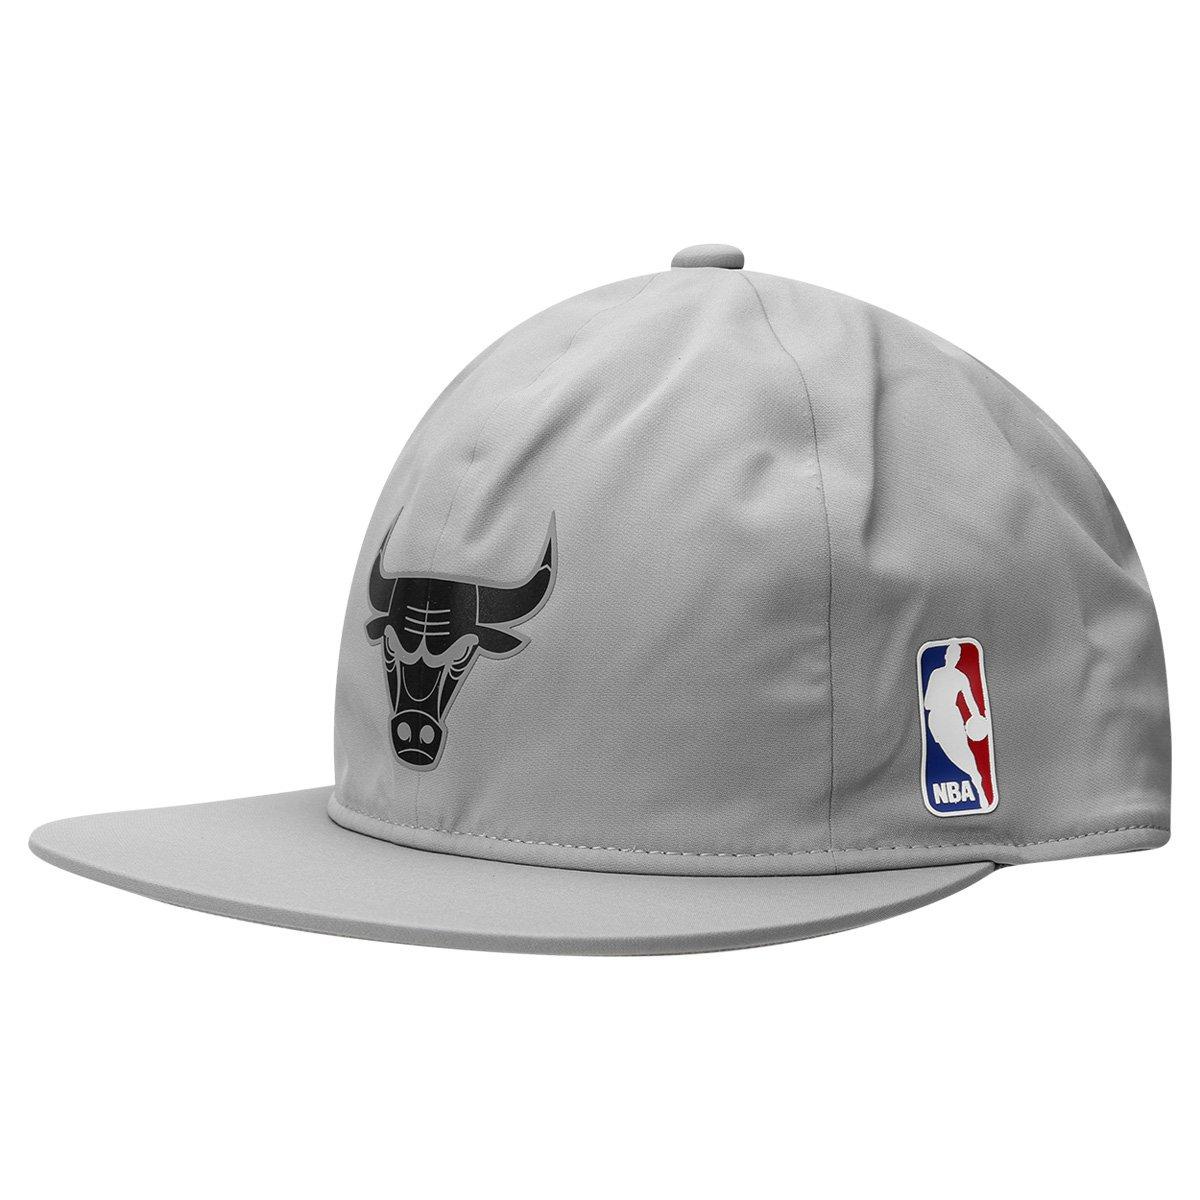 c0d7d8859b4ab Boné Adidas Aba Reta NBA Sbc Chicago Bulls - Compre Agora